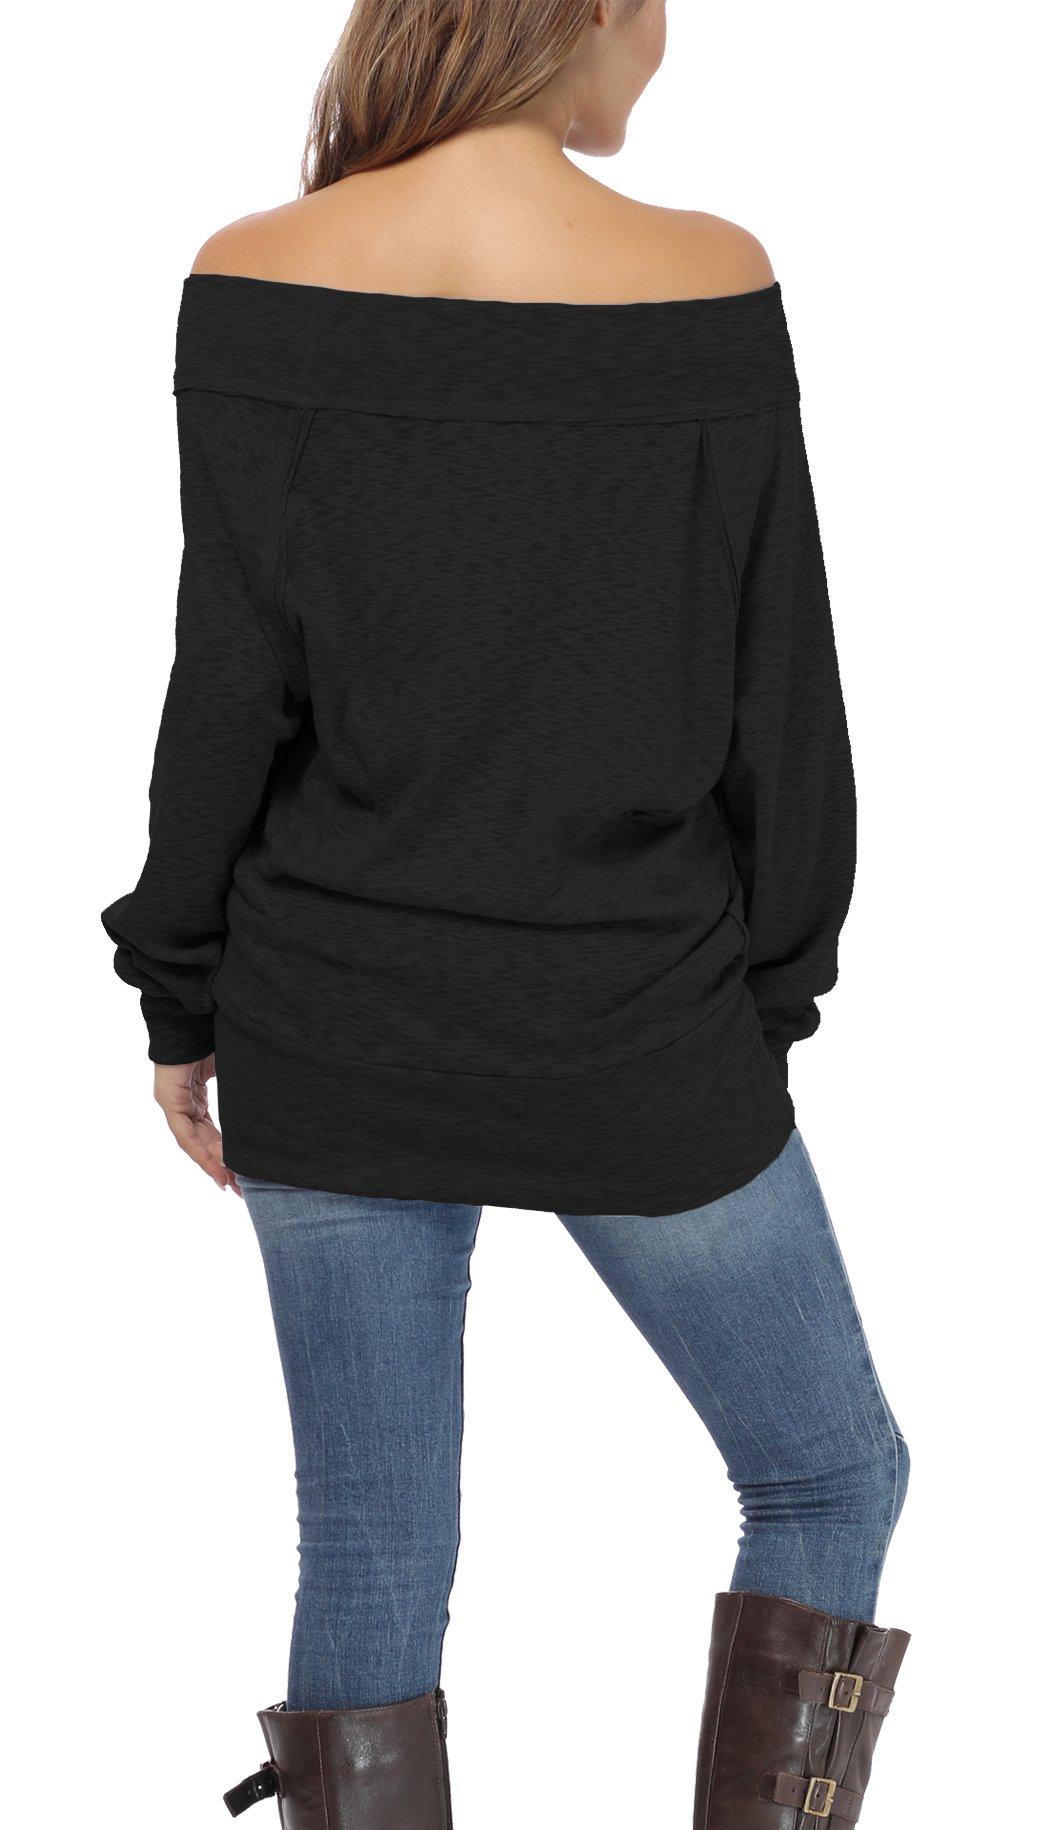 iGENJUN Women's Dolman Sleeve Off The Shoulder Sweater Shirt Tops,Black,M by iGENJUN (Image #4)